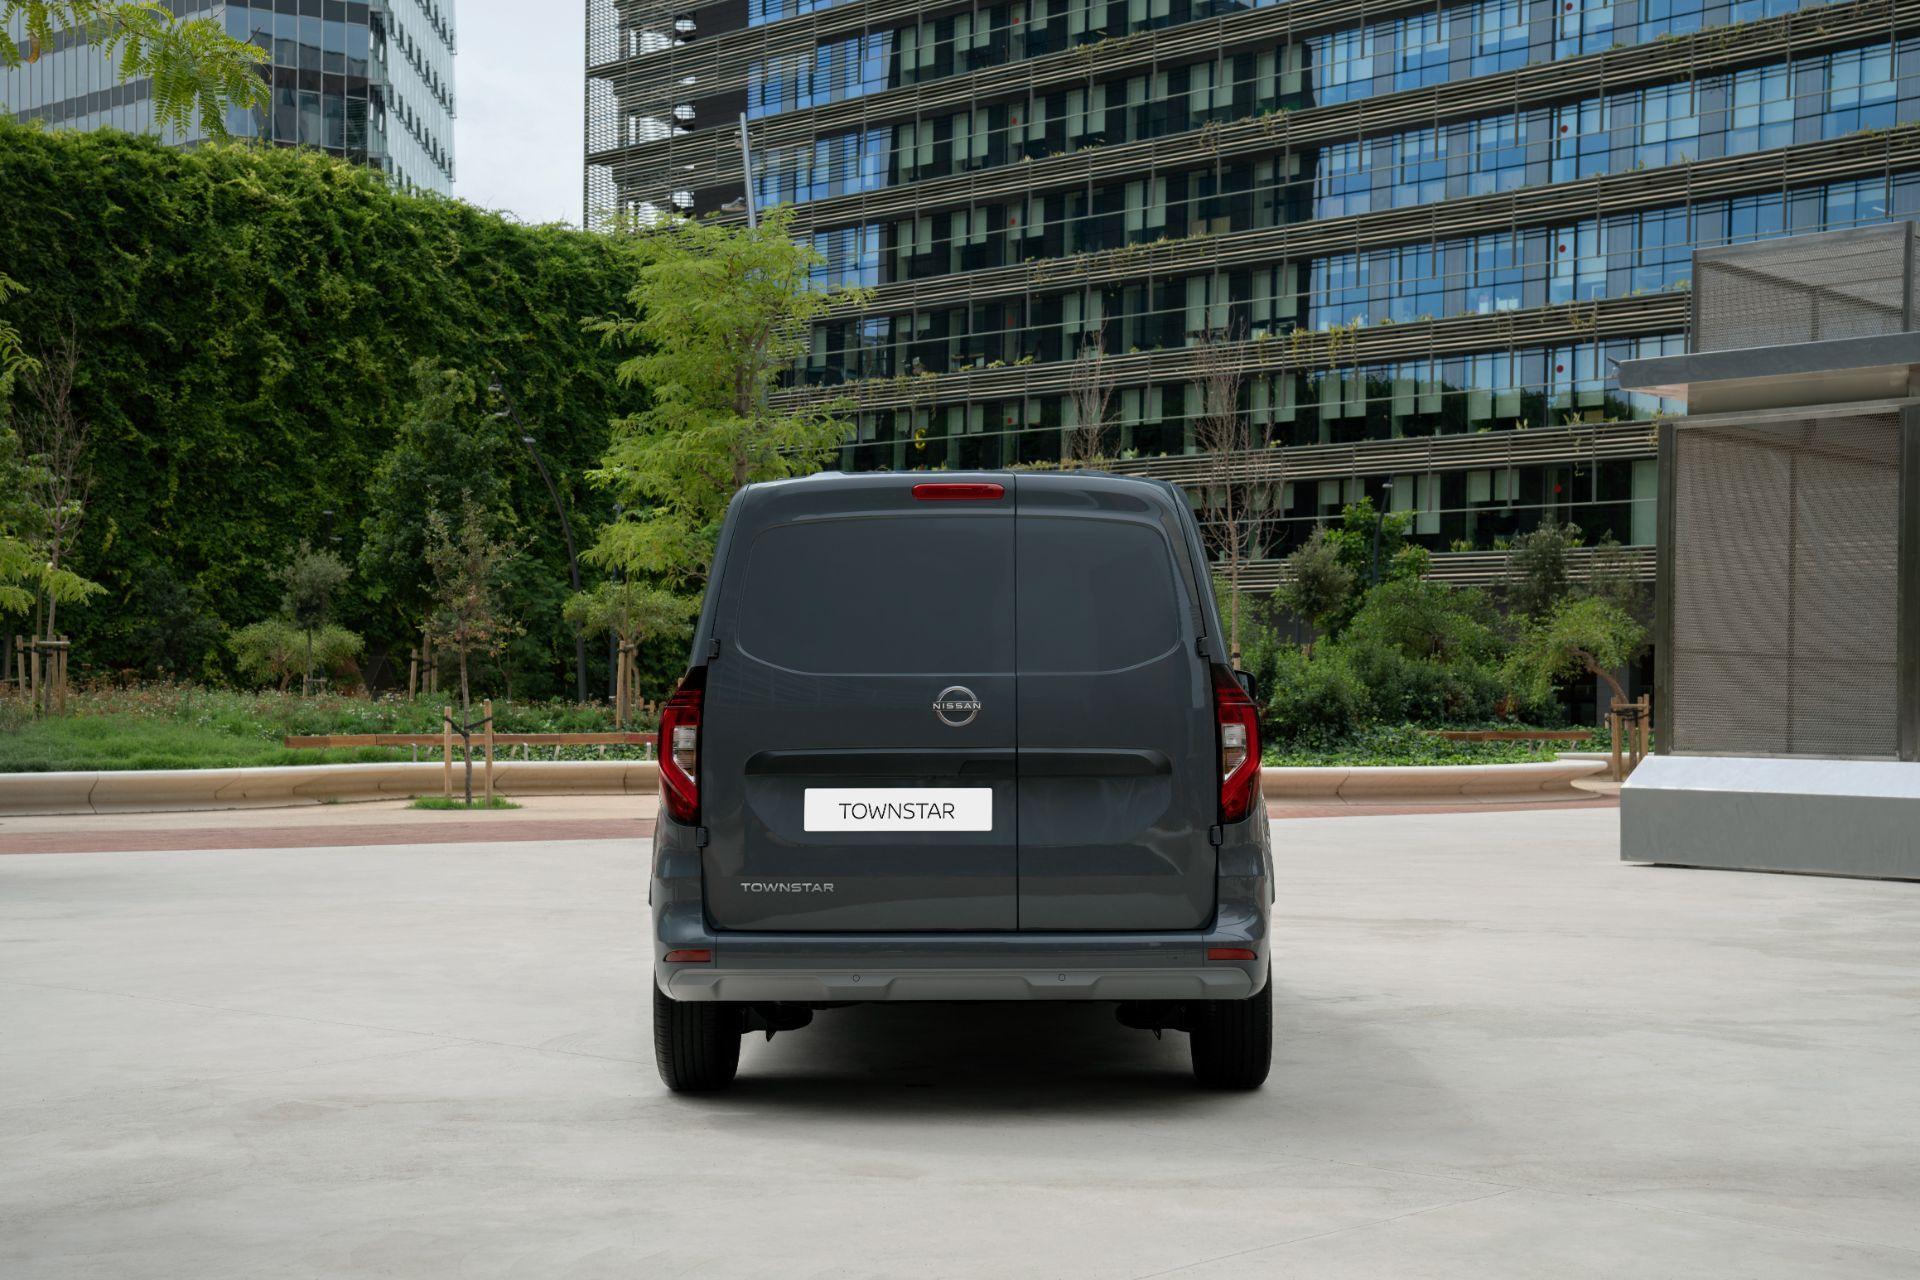 2022-Nissan-Townstar-petrol-van-dynamic-11